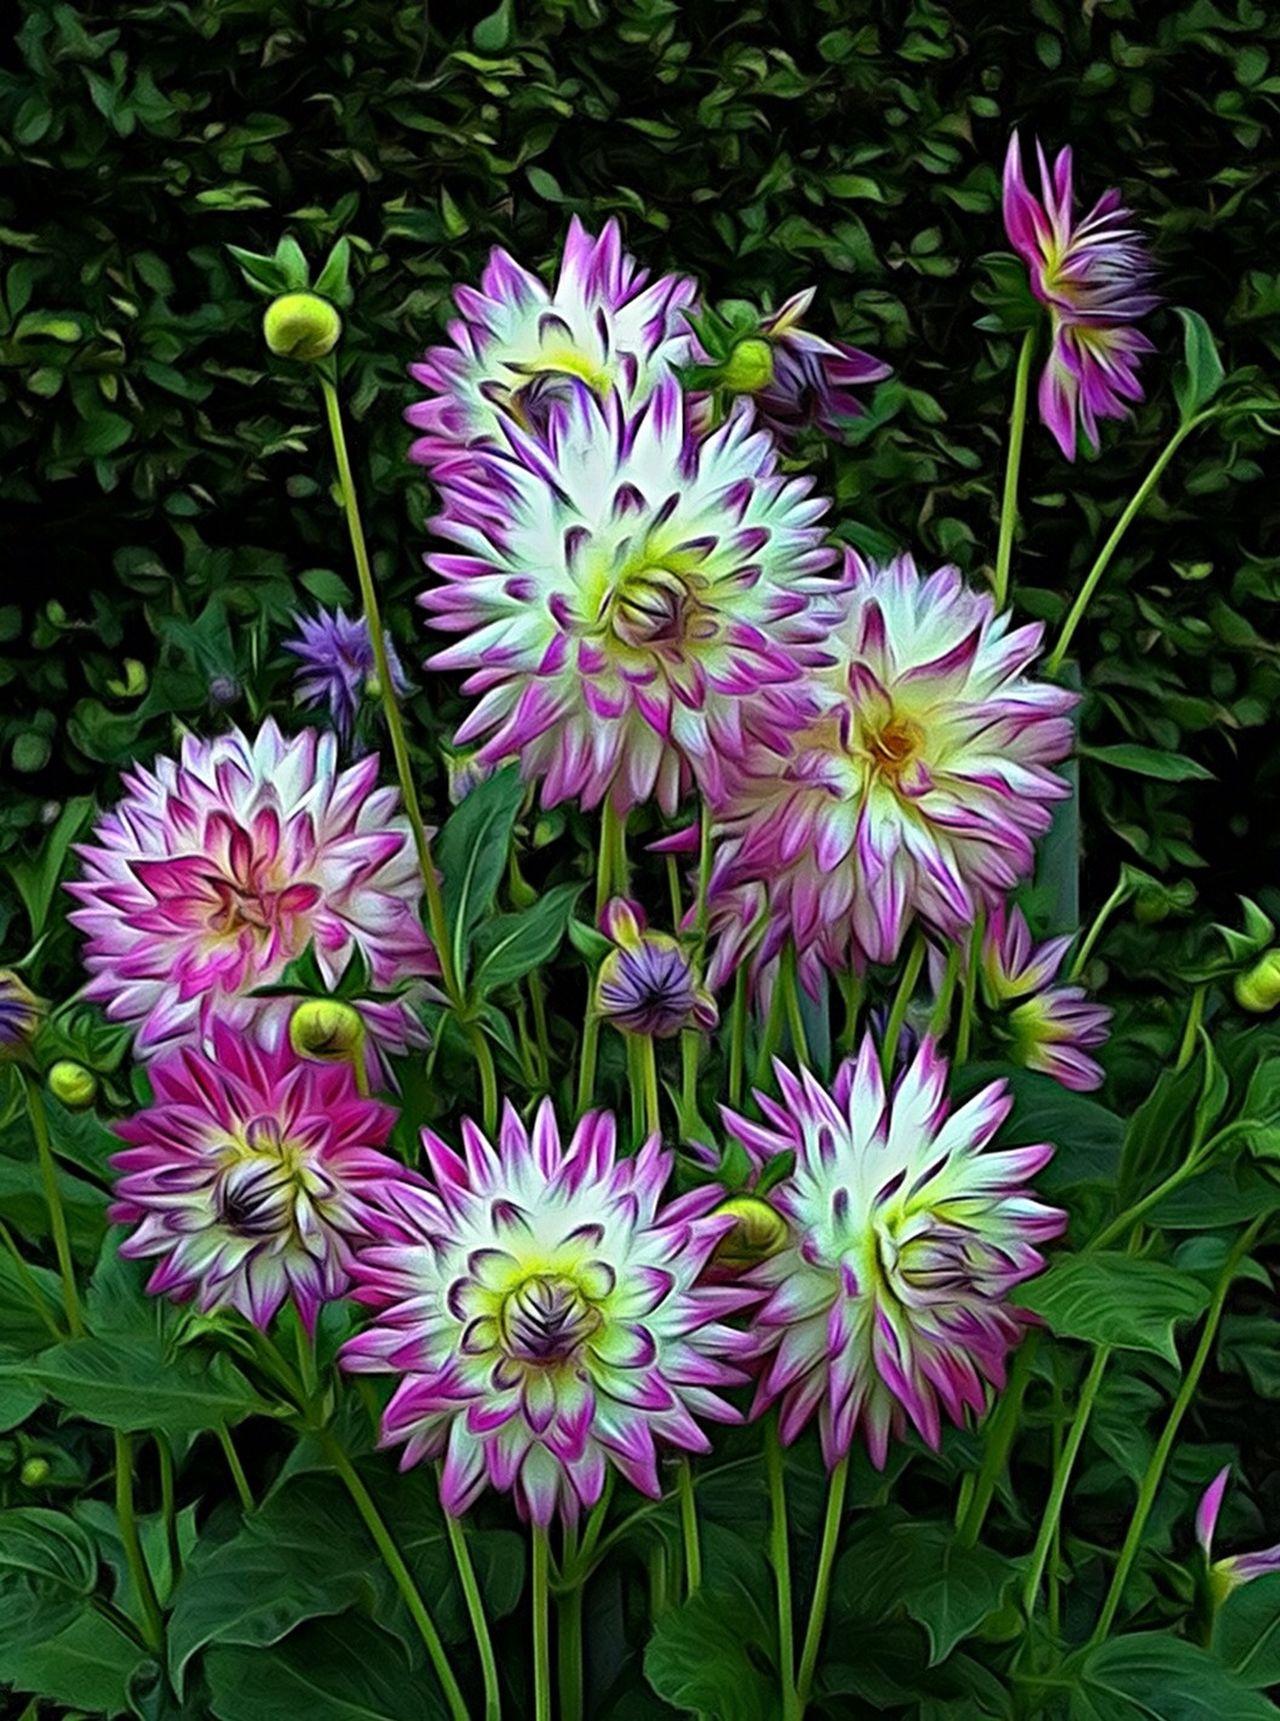 Flowers Creative Naturelover Flower Collection Dahlia Nature On Your Doorstep Flowers,Plants & Garden EyeEm Best Shots - Nature EyeEm Nature Lover Jopesfotos - Nature